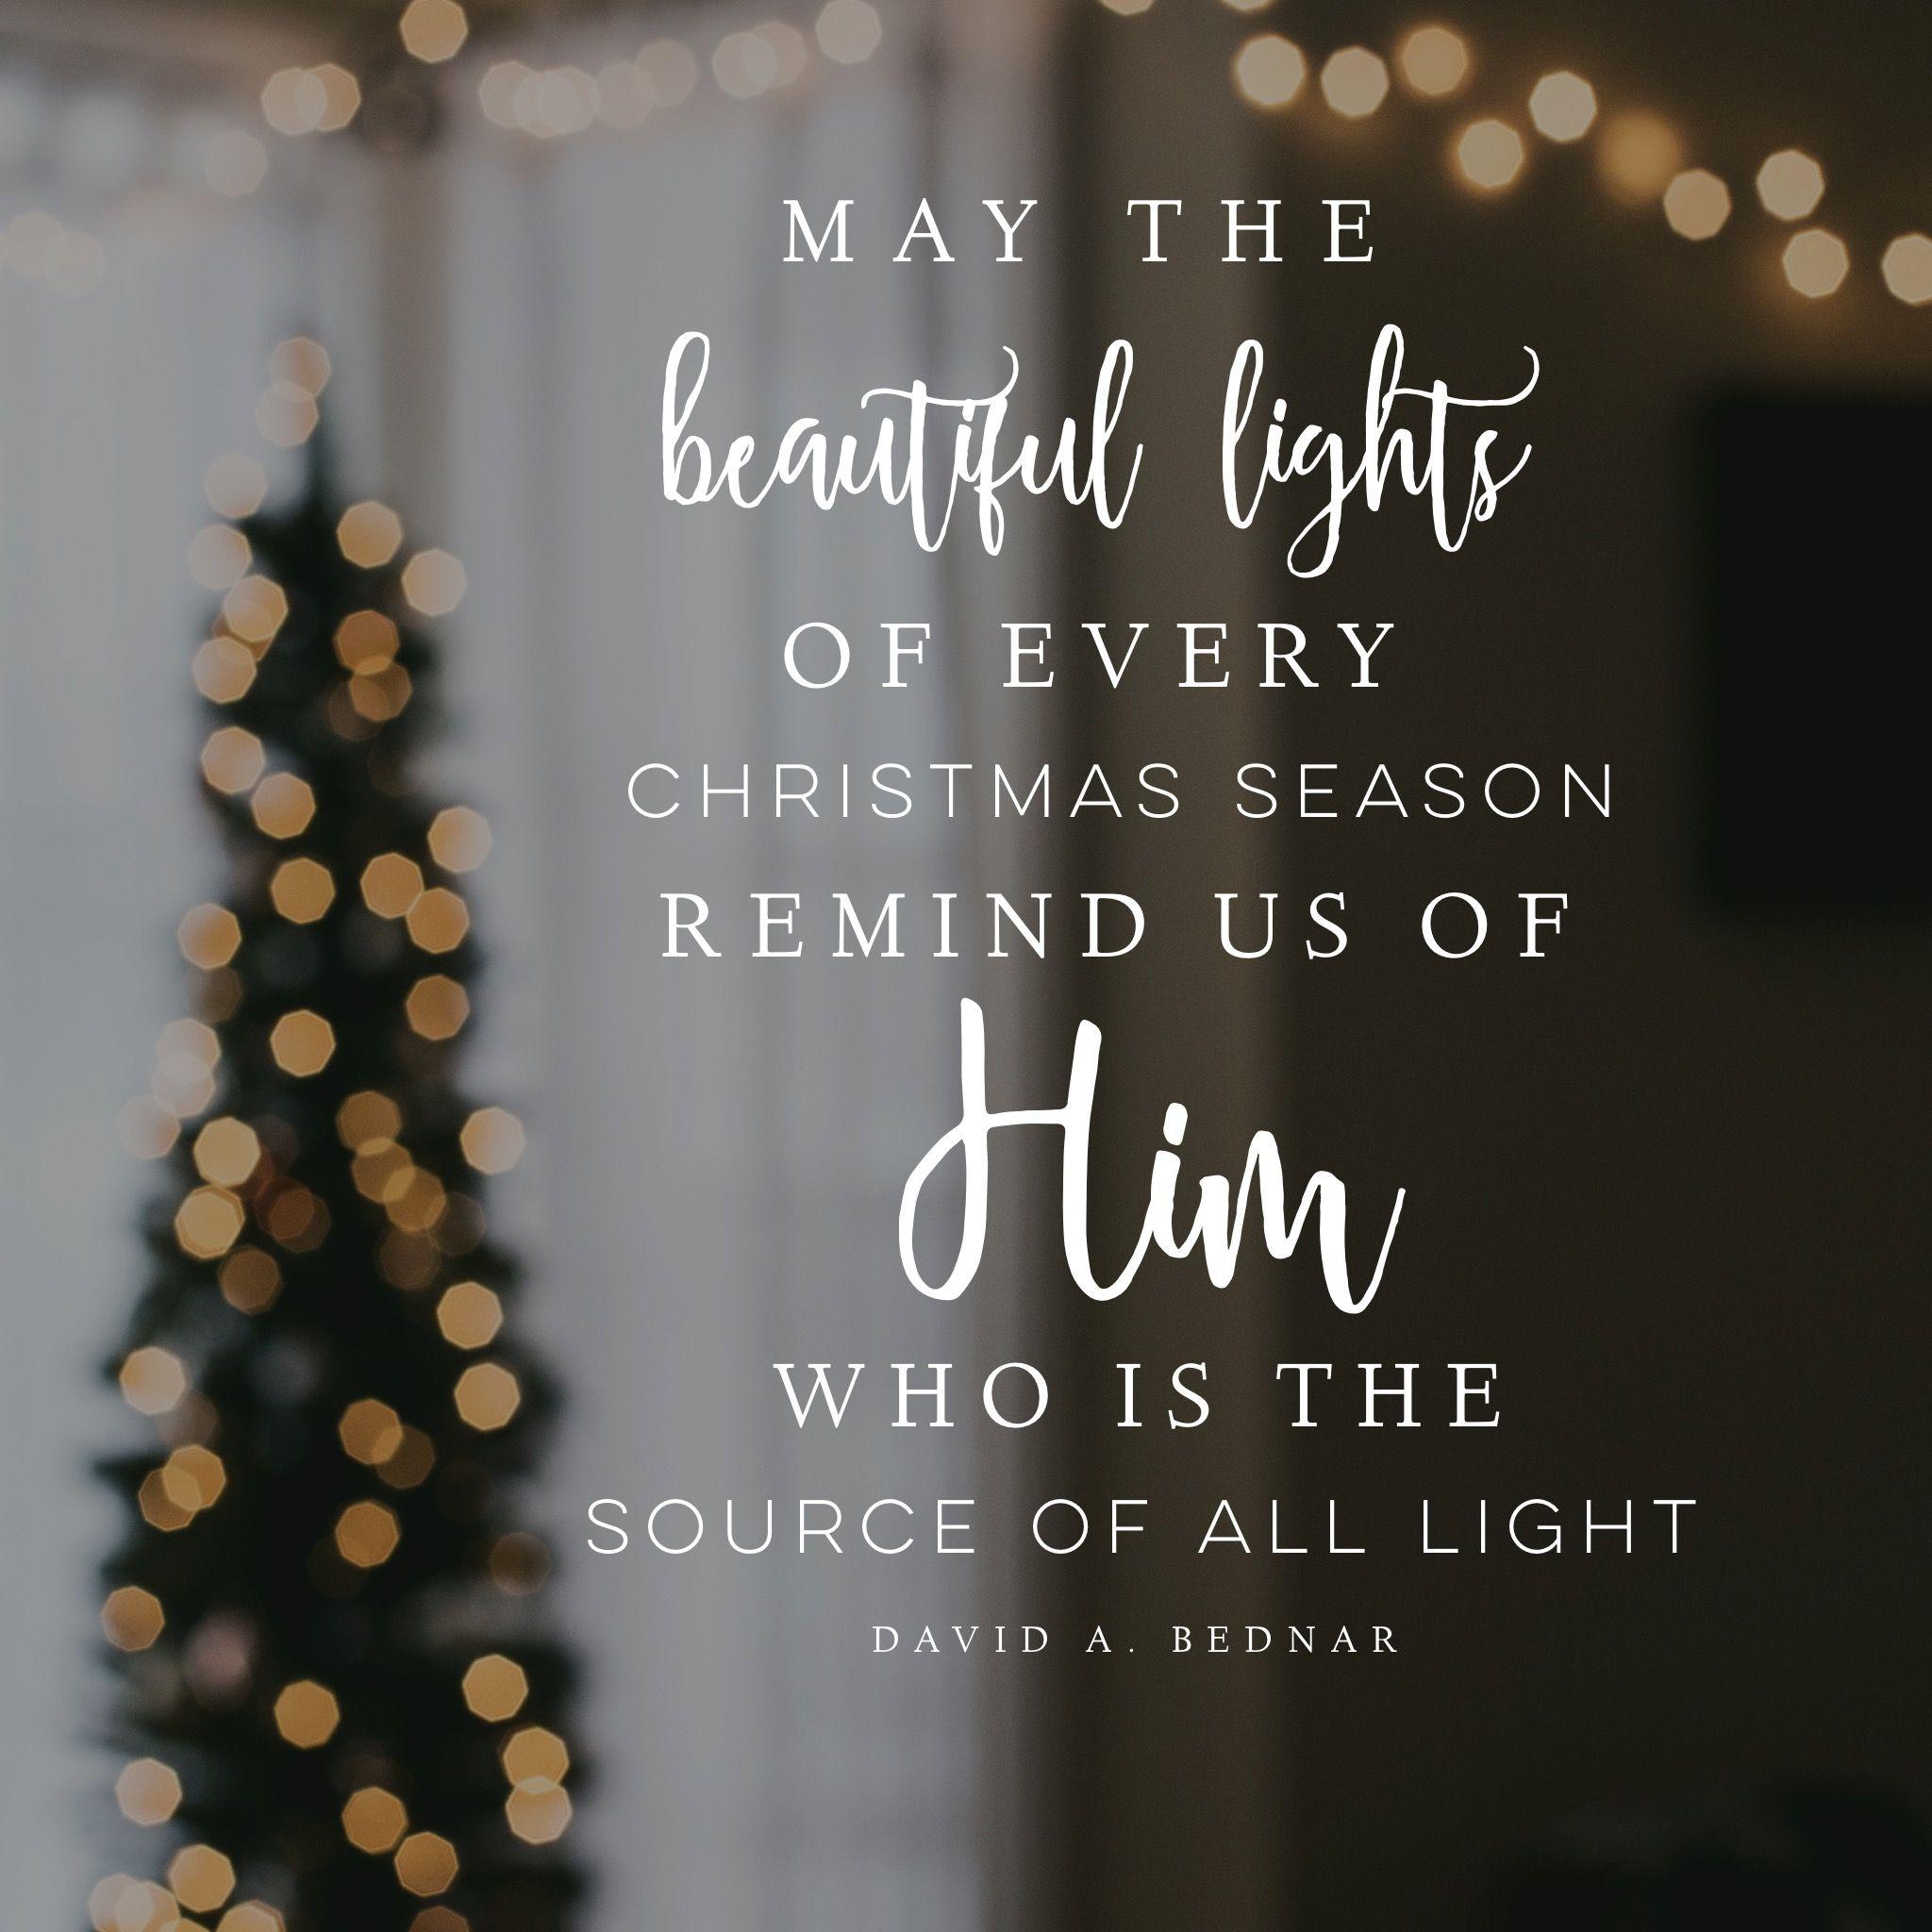 """May the beautiful lights of every Christmas season remind"